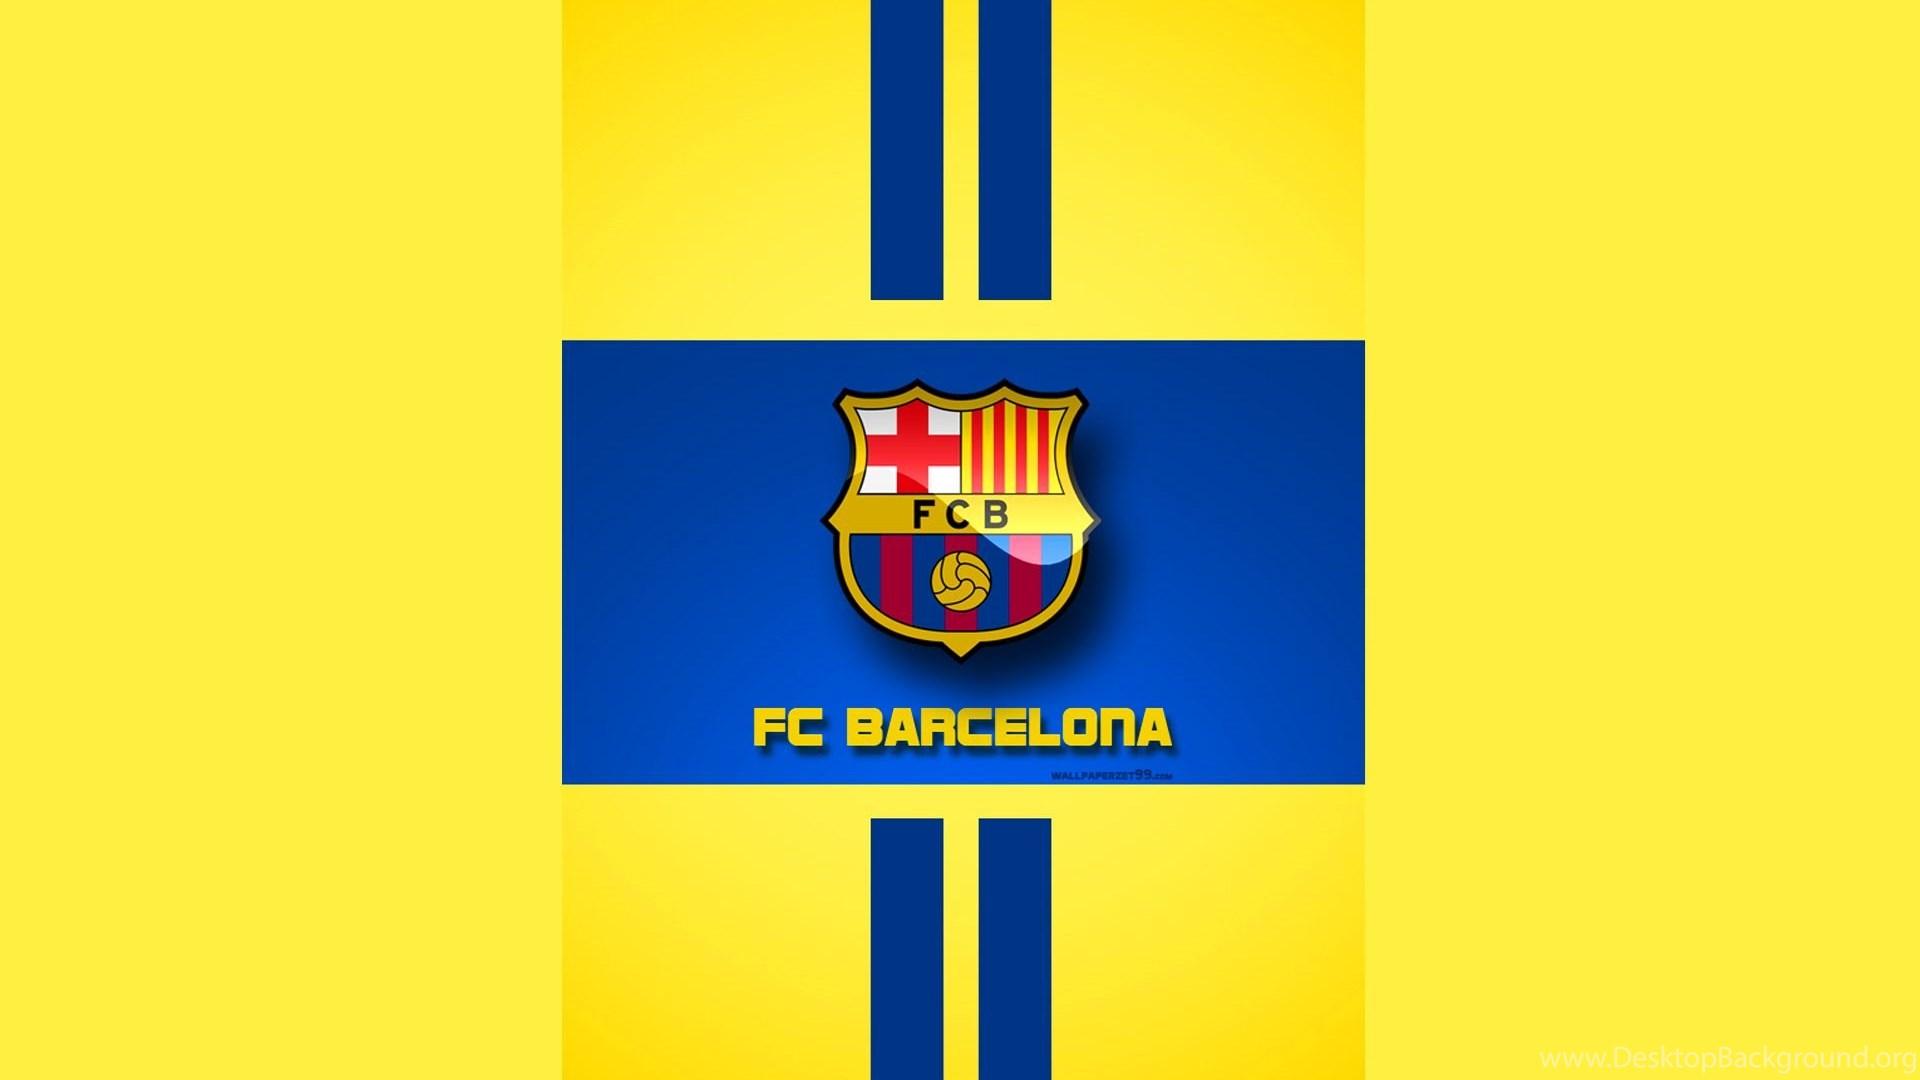 Fc Barcelona Logo Iphone Wallpapers Hd Wallpapers Rate Desktop Background